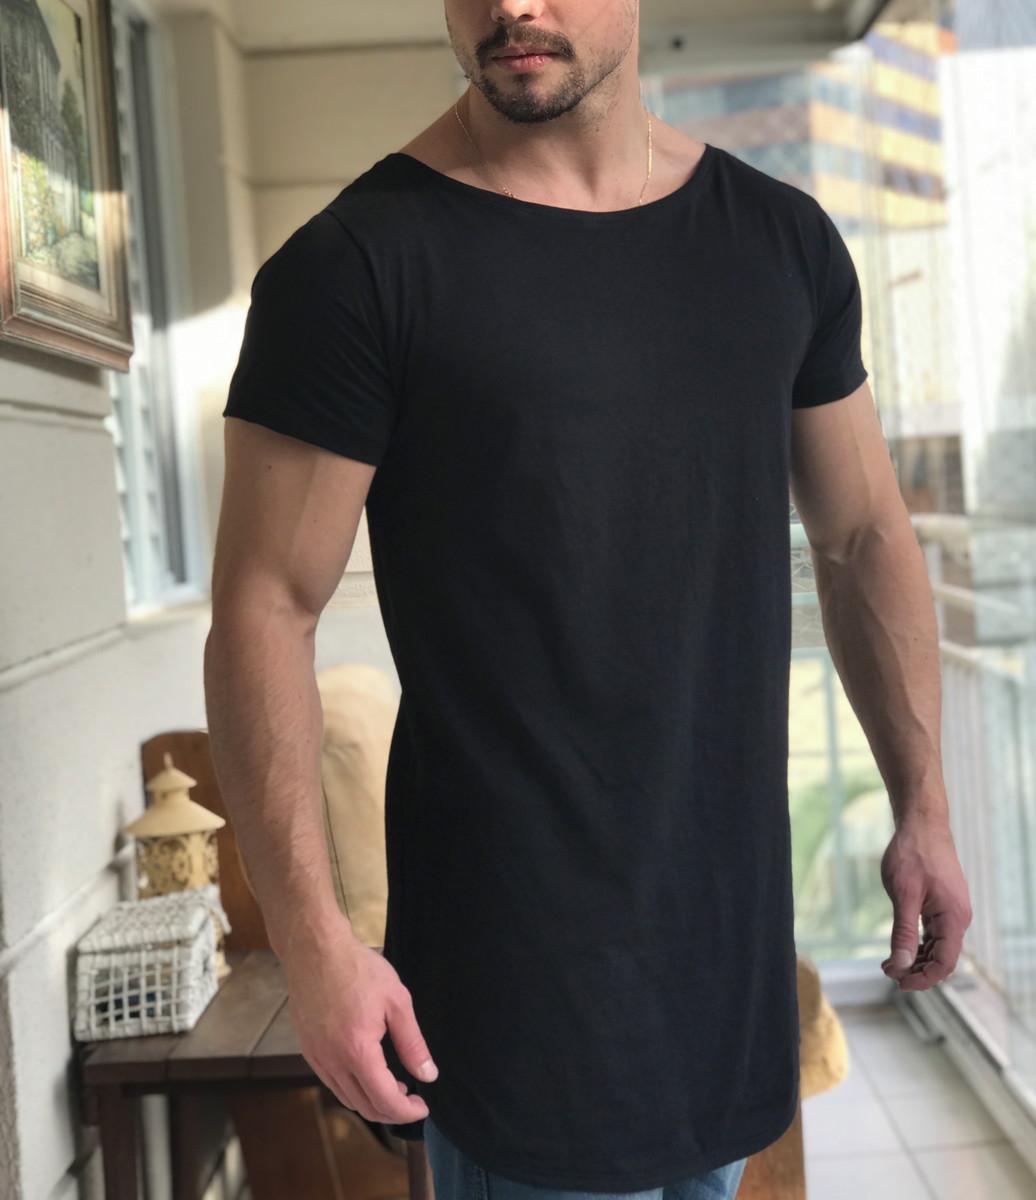 d5a2138709 Camiseta Preta Oversized Longline Alongada Masculina no Elo7